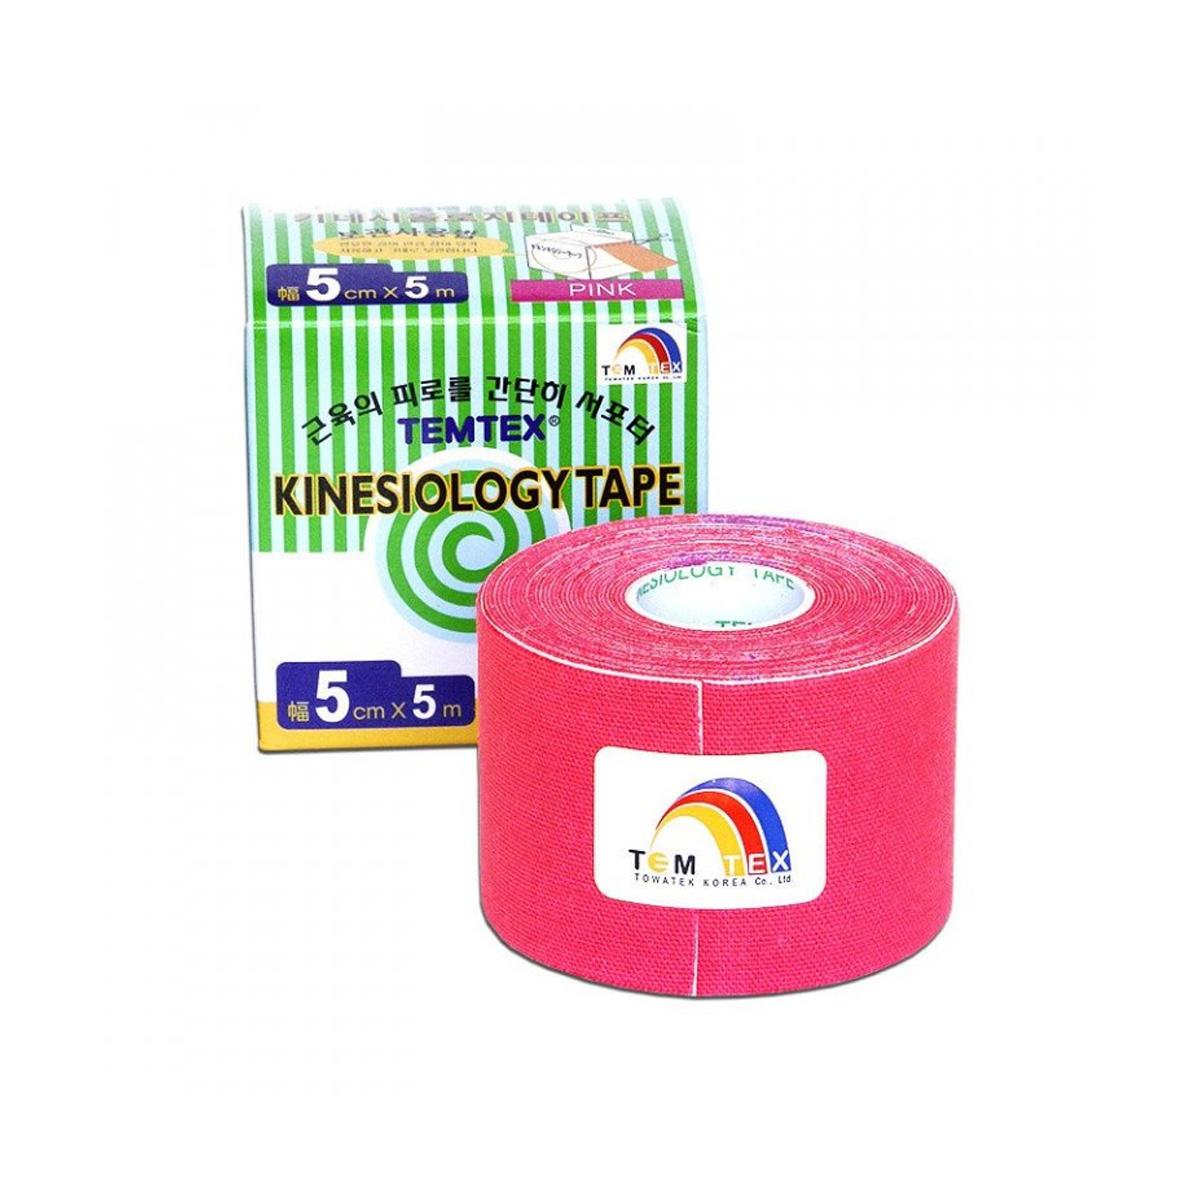 Temtex kinesio tape Classic růžová 5cm x 5m